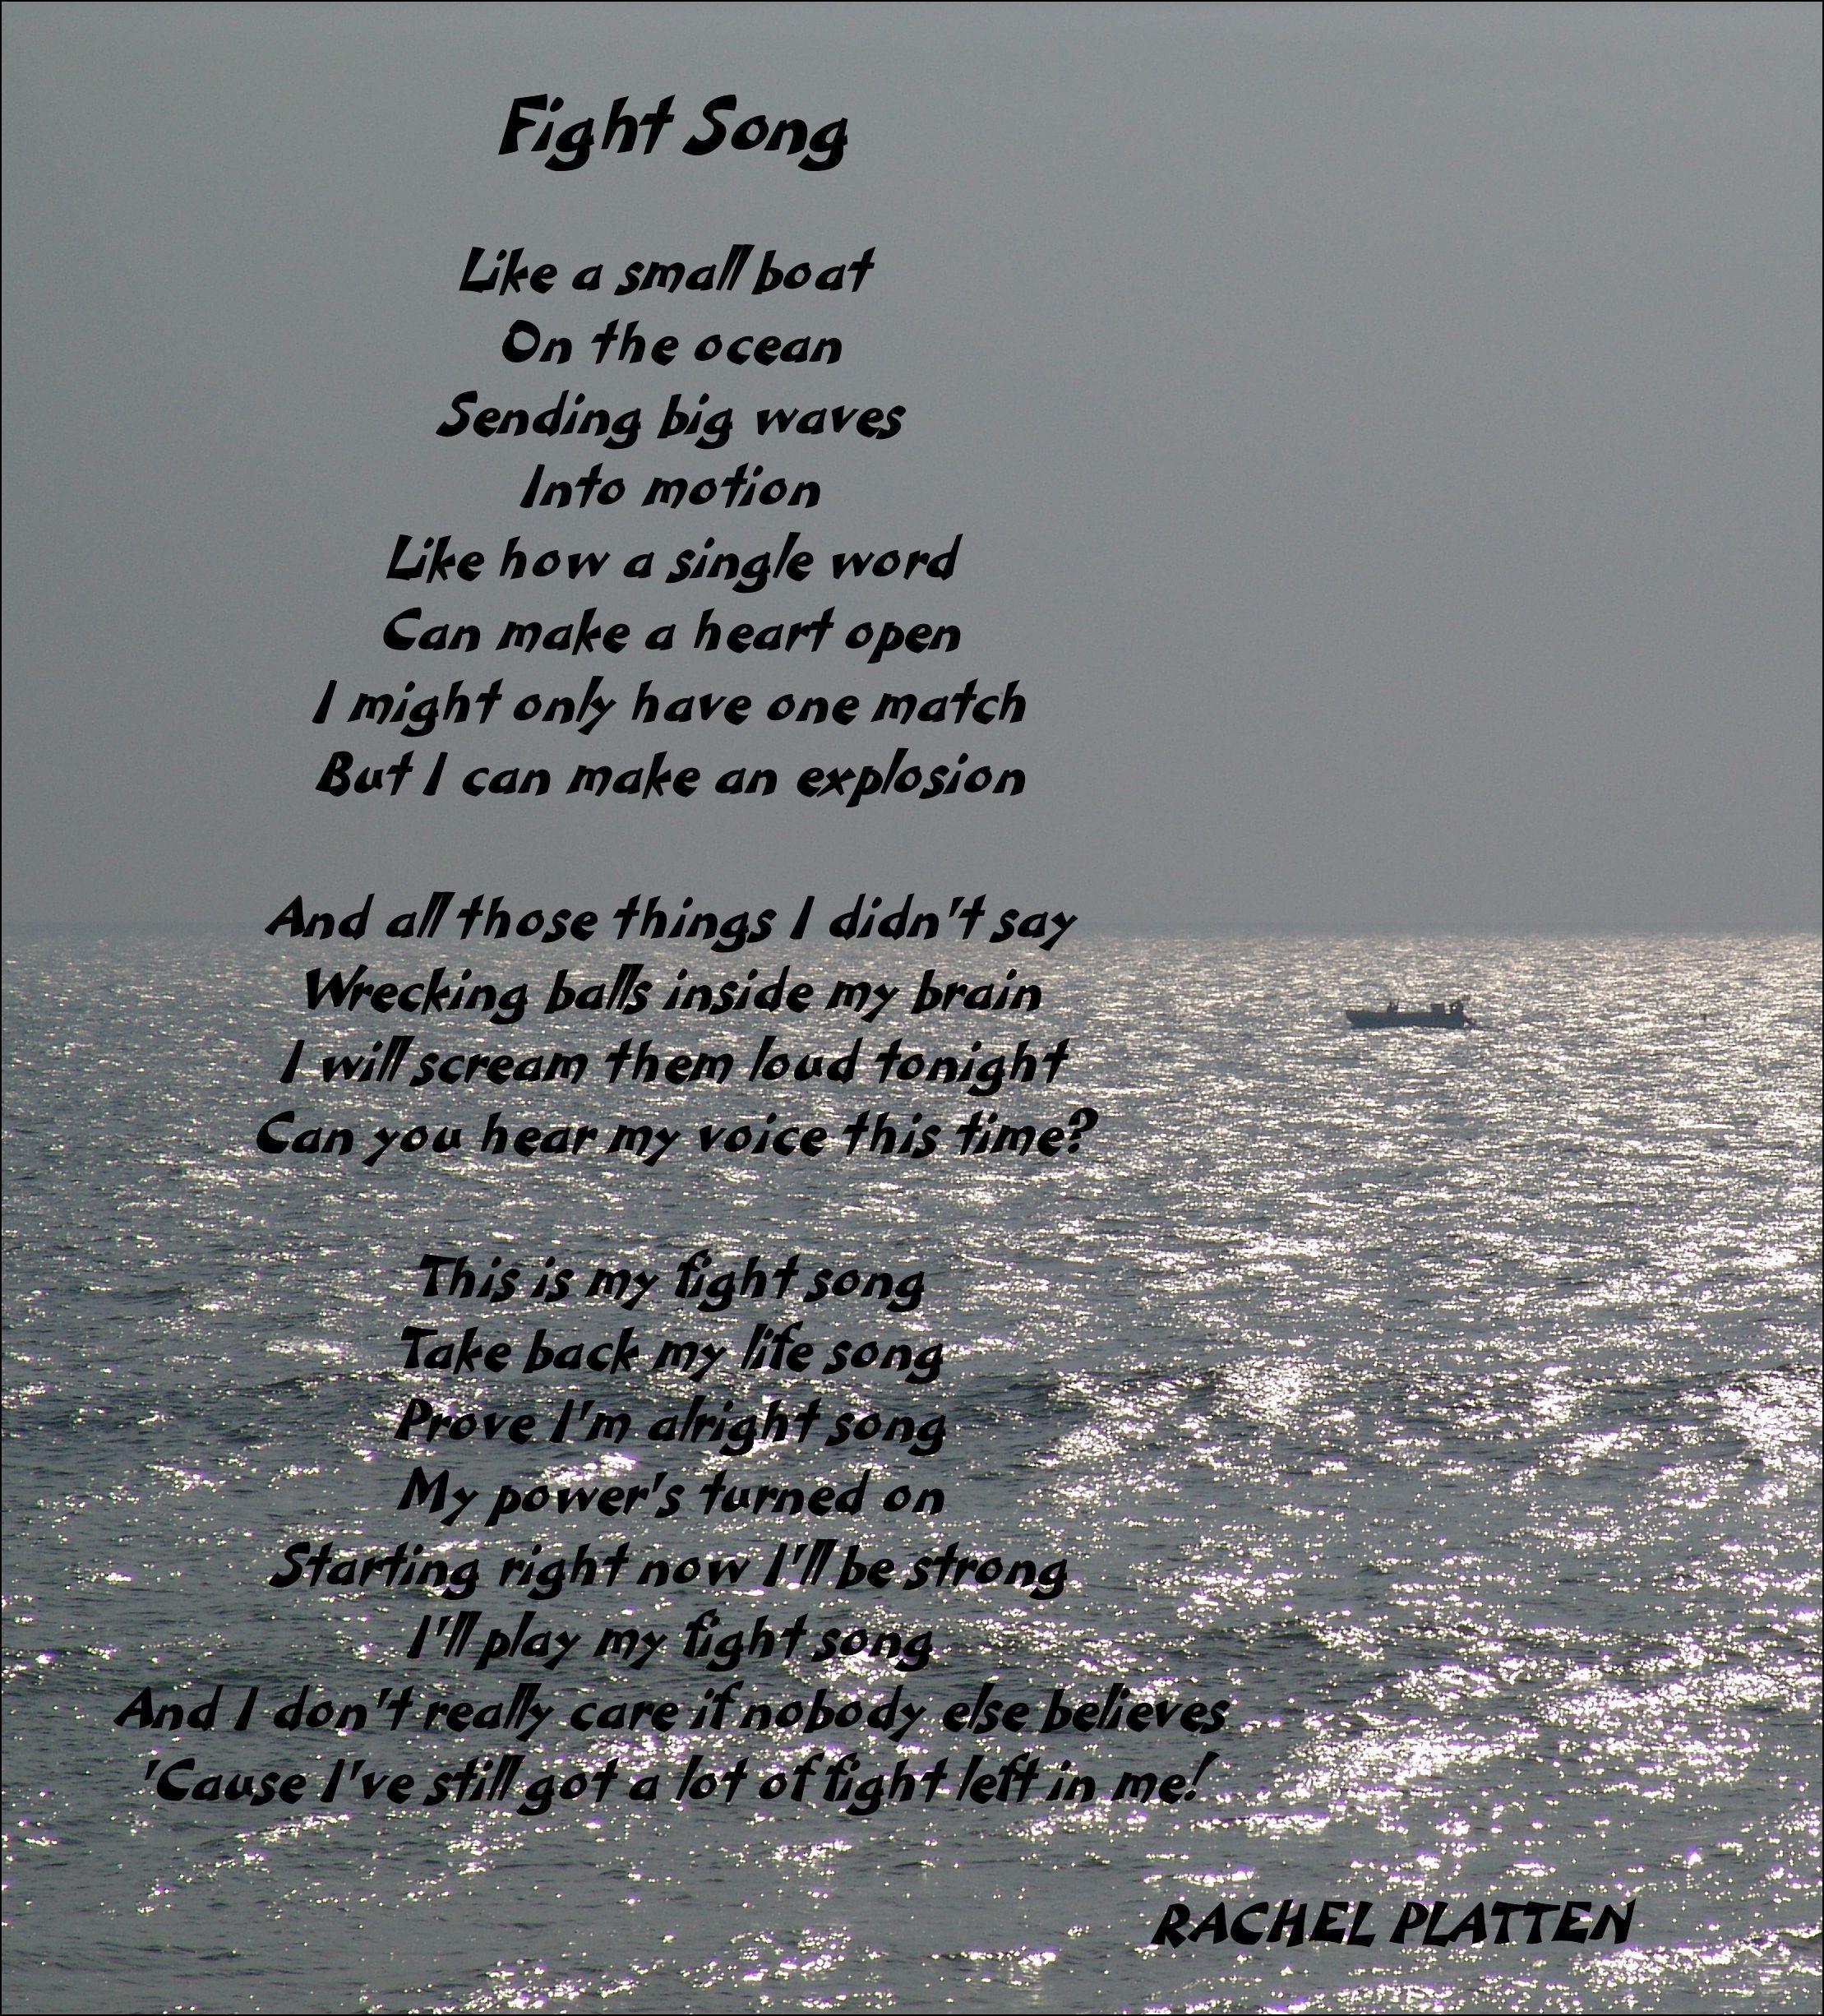 Lyrics: Rachel Platten - Fight Song